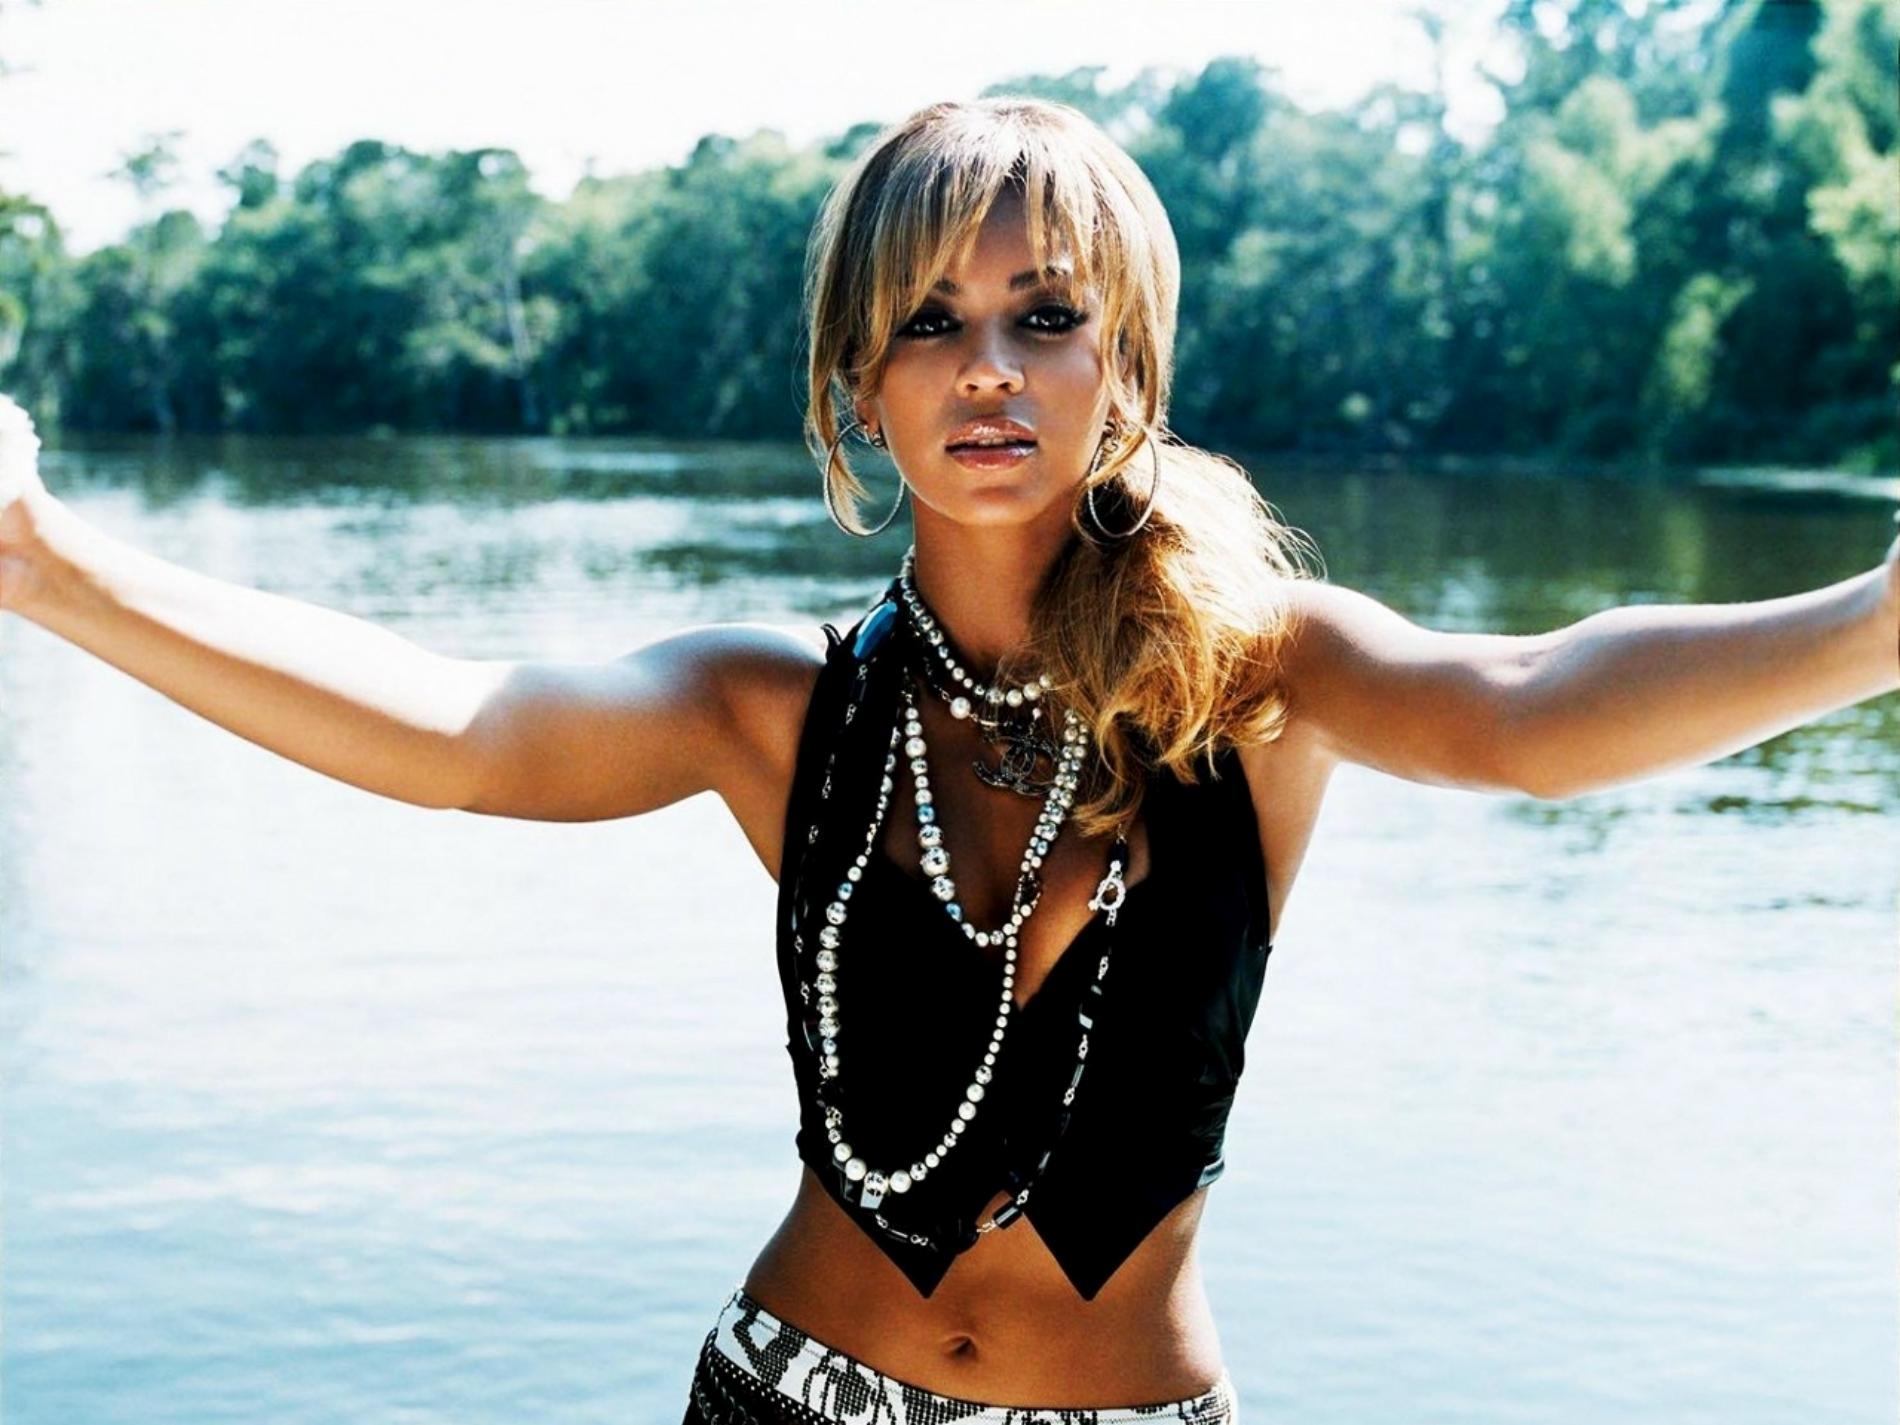 http://2.bp.blogspot.com/-Y8f-jghYZNA/UREtRI30exI/AAAAAAAAHIo/zYQIlVAyKo8/s2000/Beyonce-River-Landscape-Behind-HD-Wallpaper-Vvallpaper.Net.jpg